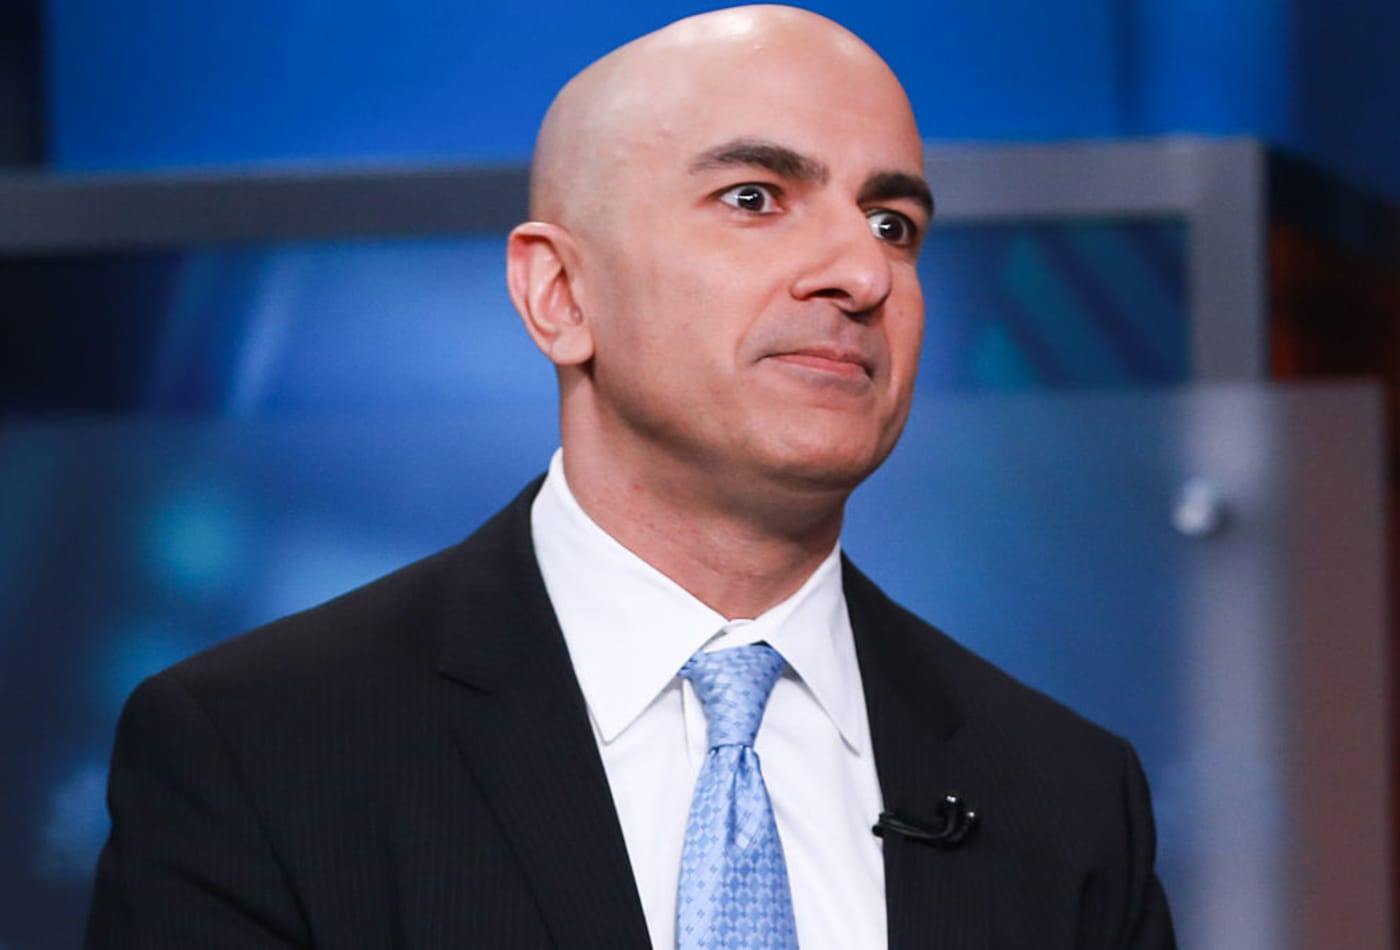 Fed's Kashkari advocates six-week economic lockdown to defeat the coronavirus